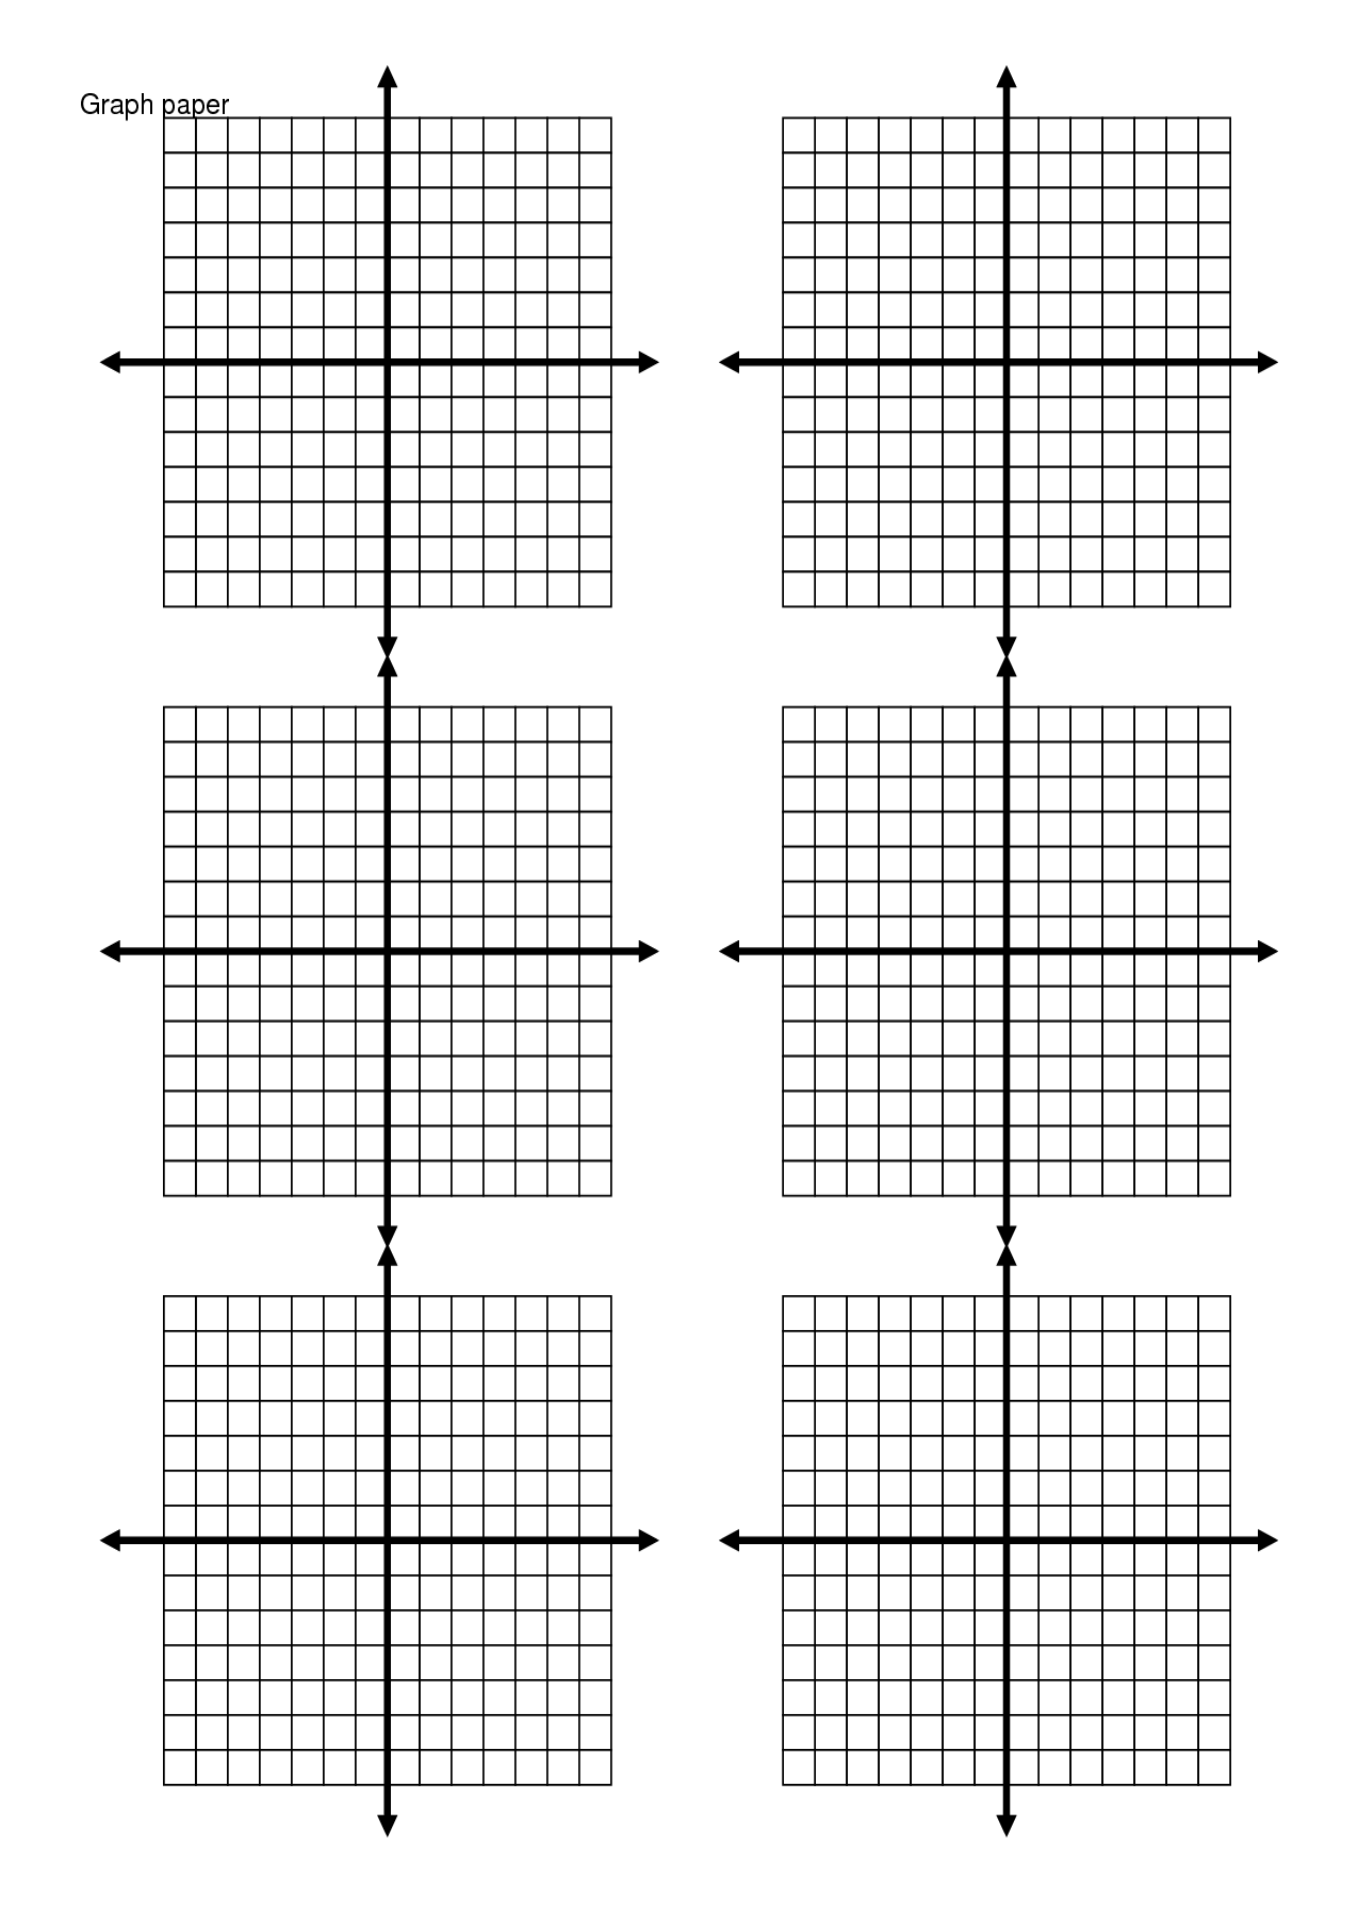 9 Best Images Of Free Coordinate Grid Worksheets